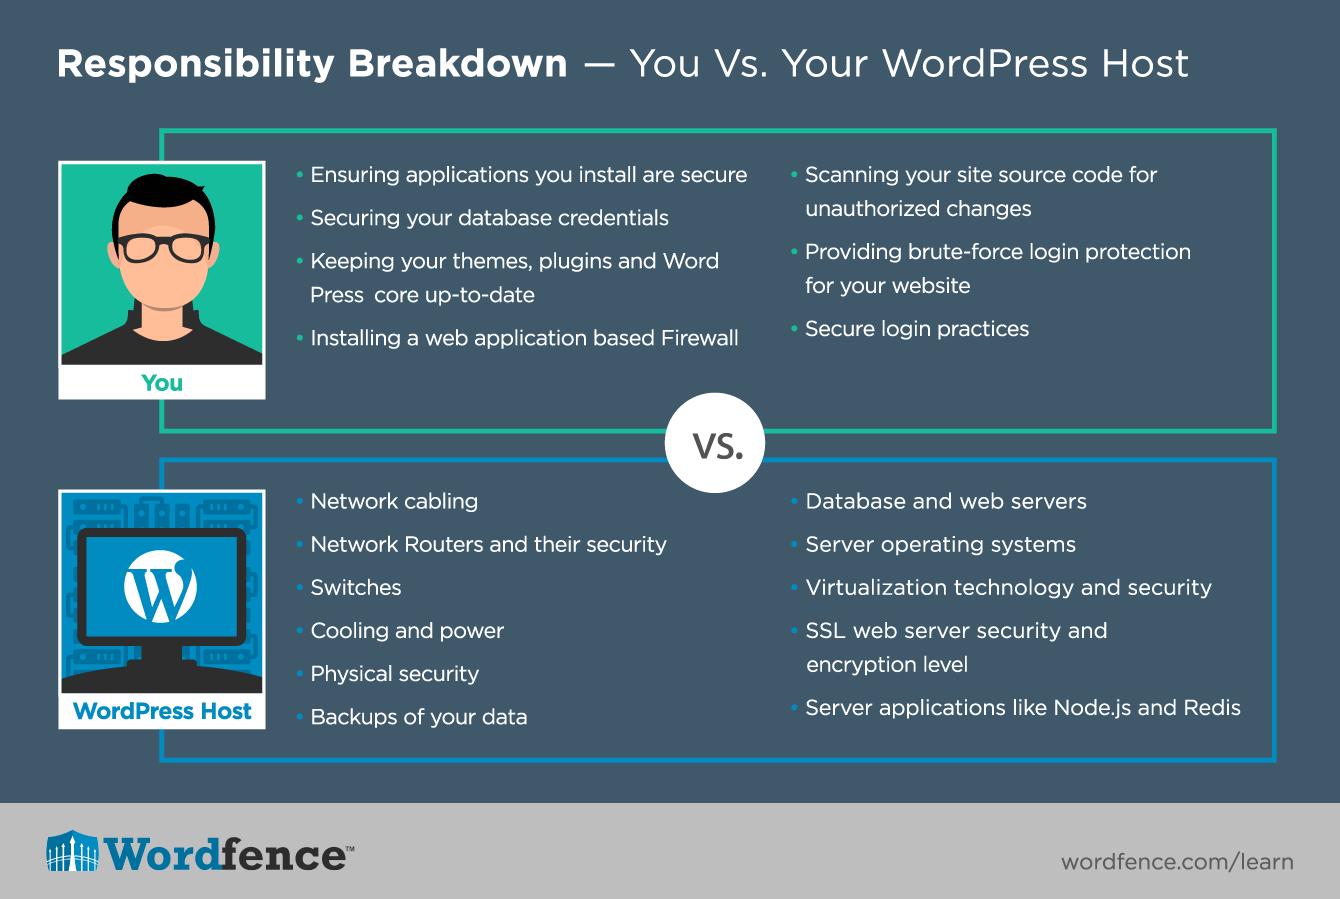 wordfence responsibility breakdown